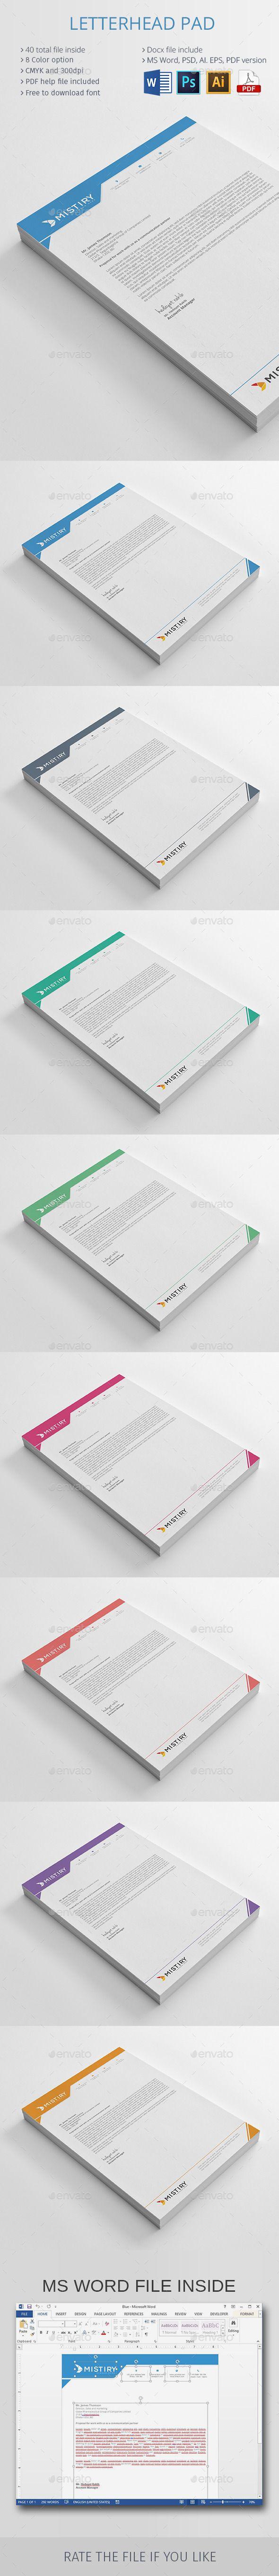 Free Letterhead Templates For Word Letterhead Pad  Pinterest  Stationery Printing Print Templates .